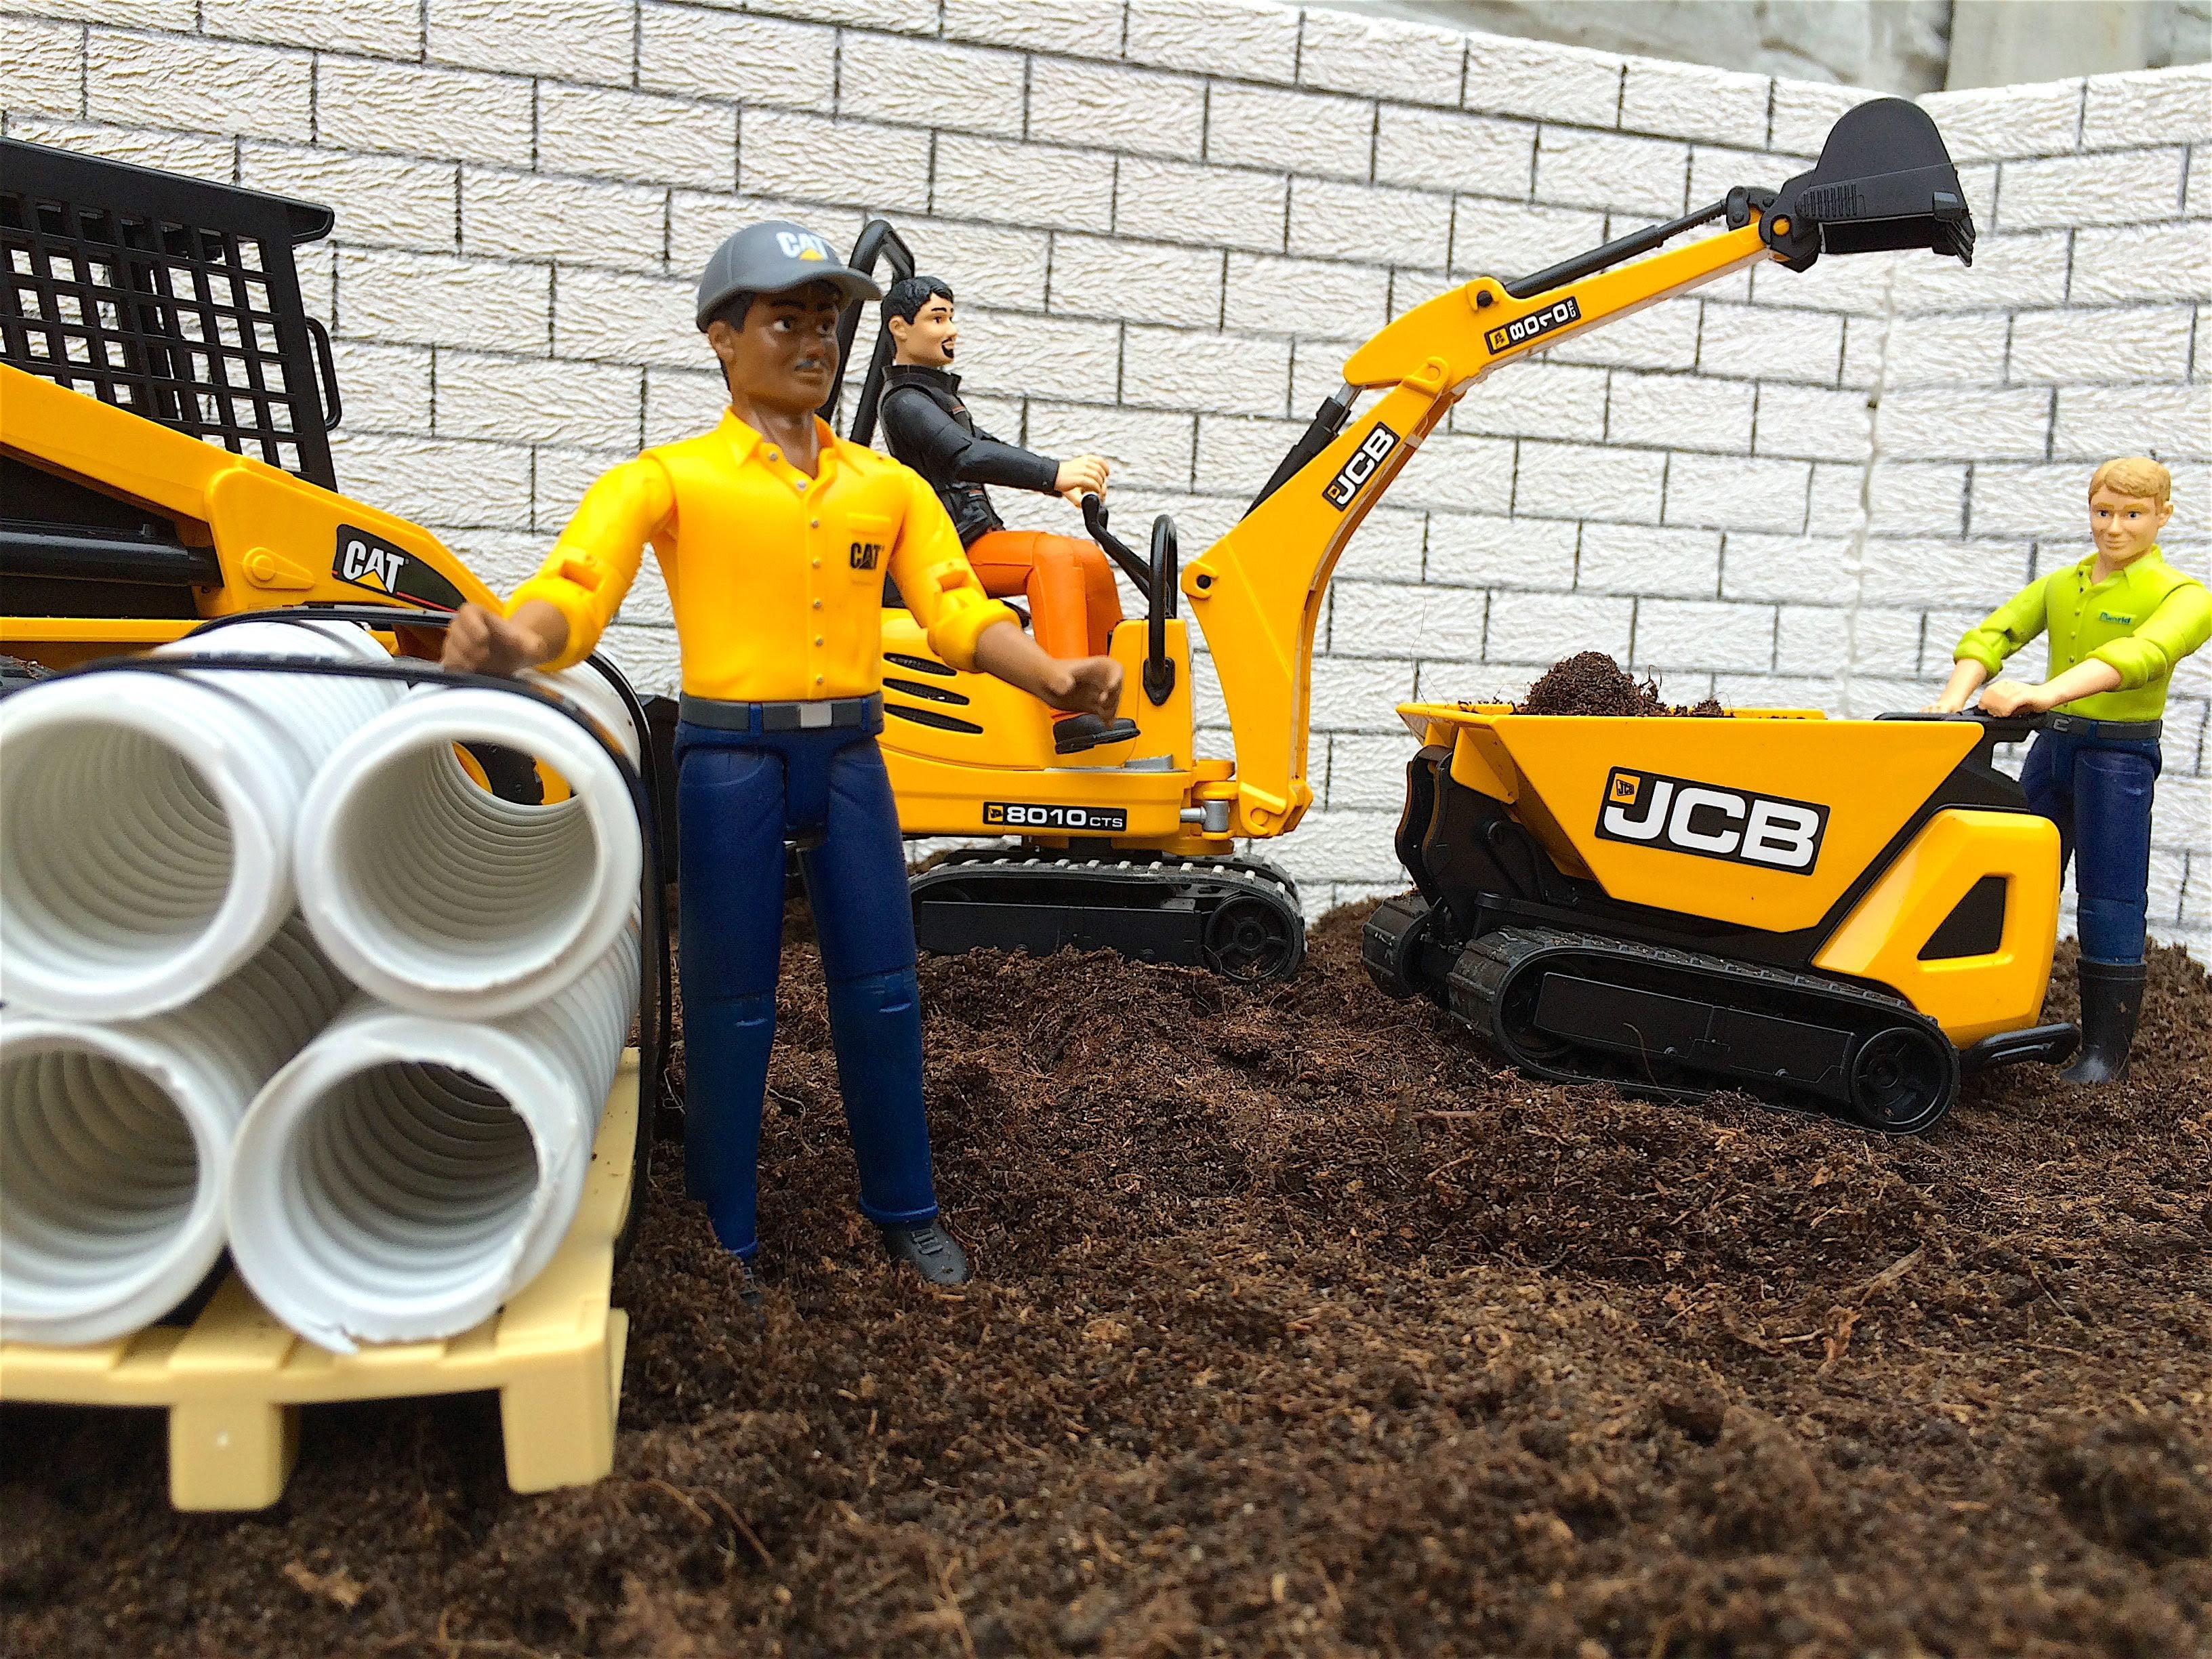 john deere 210 lawn tractor wiring diagram ceiling fan remote control 300b fuel system ~ elsalvadorla